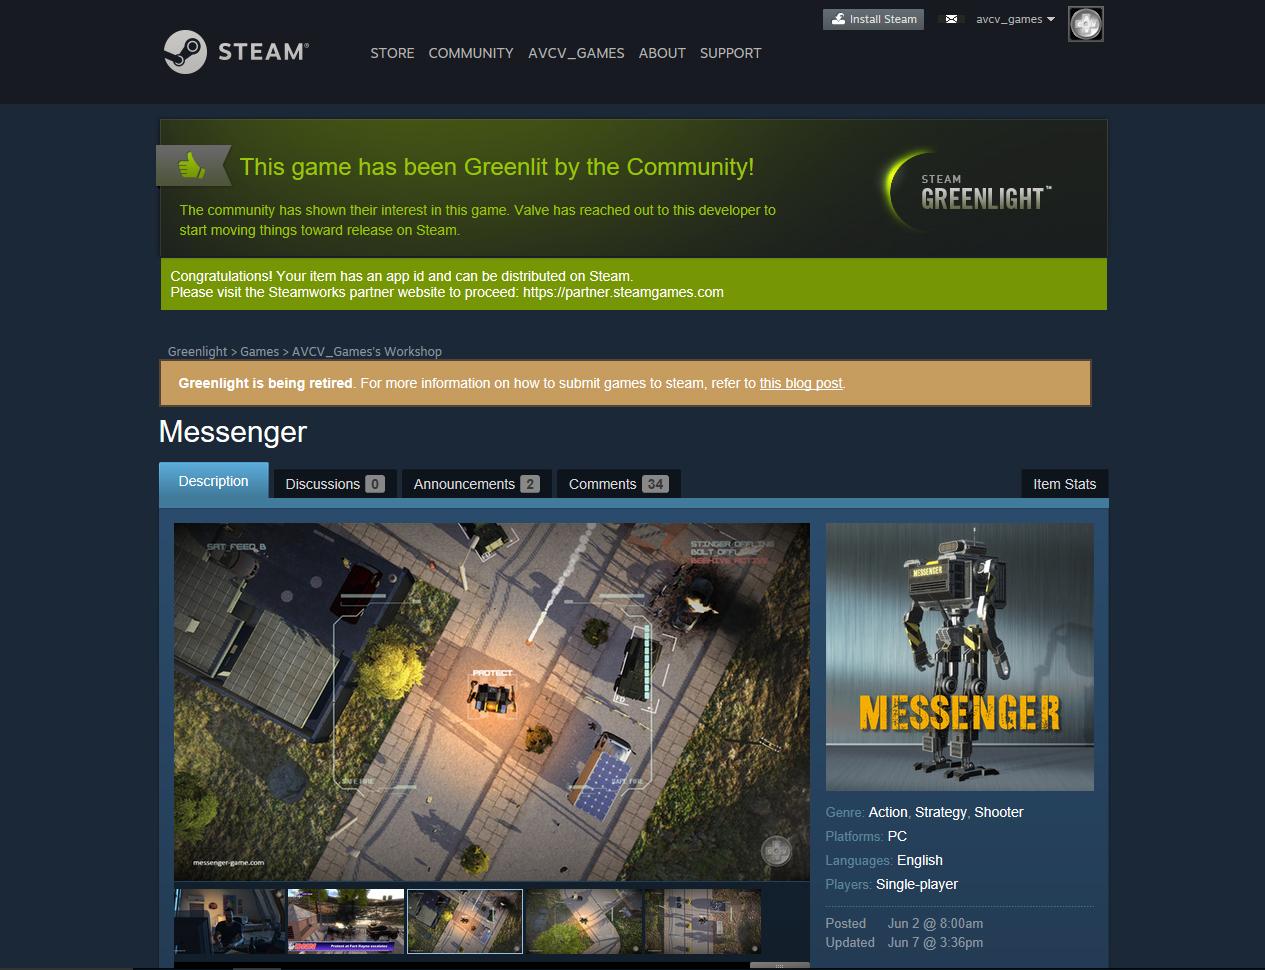 Messenger on Steam